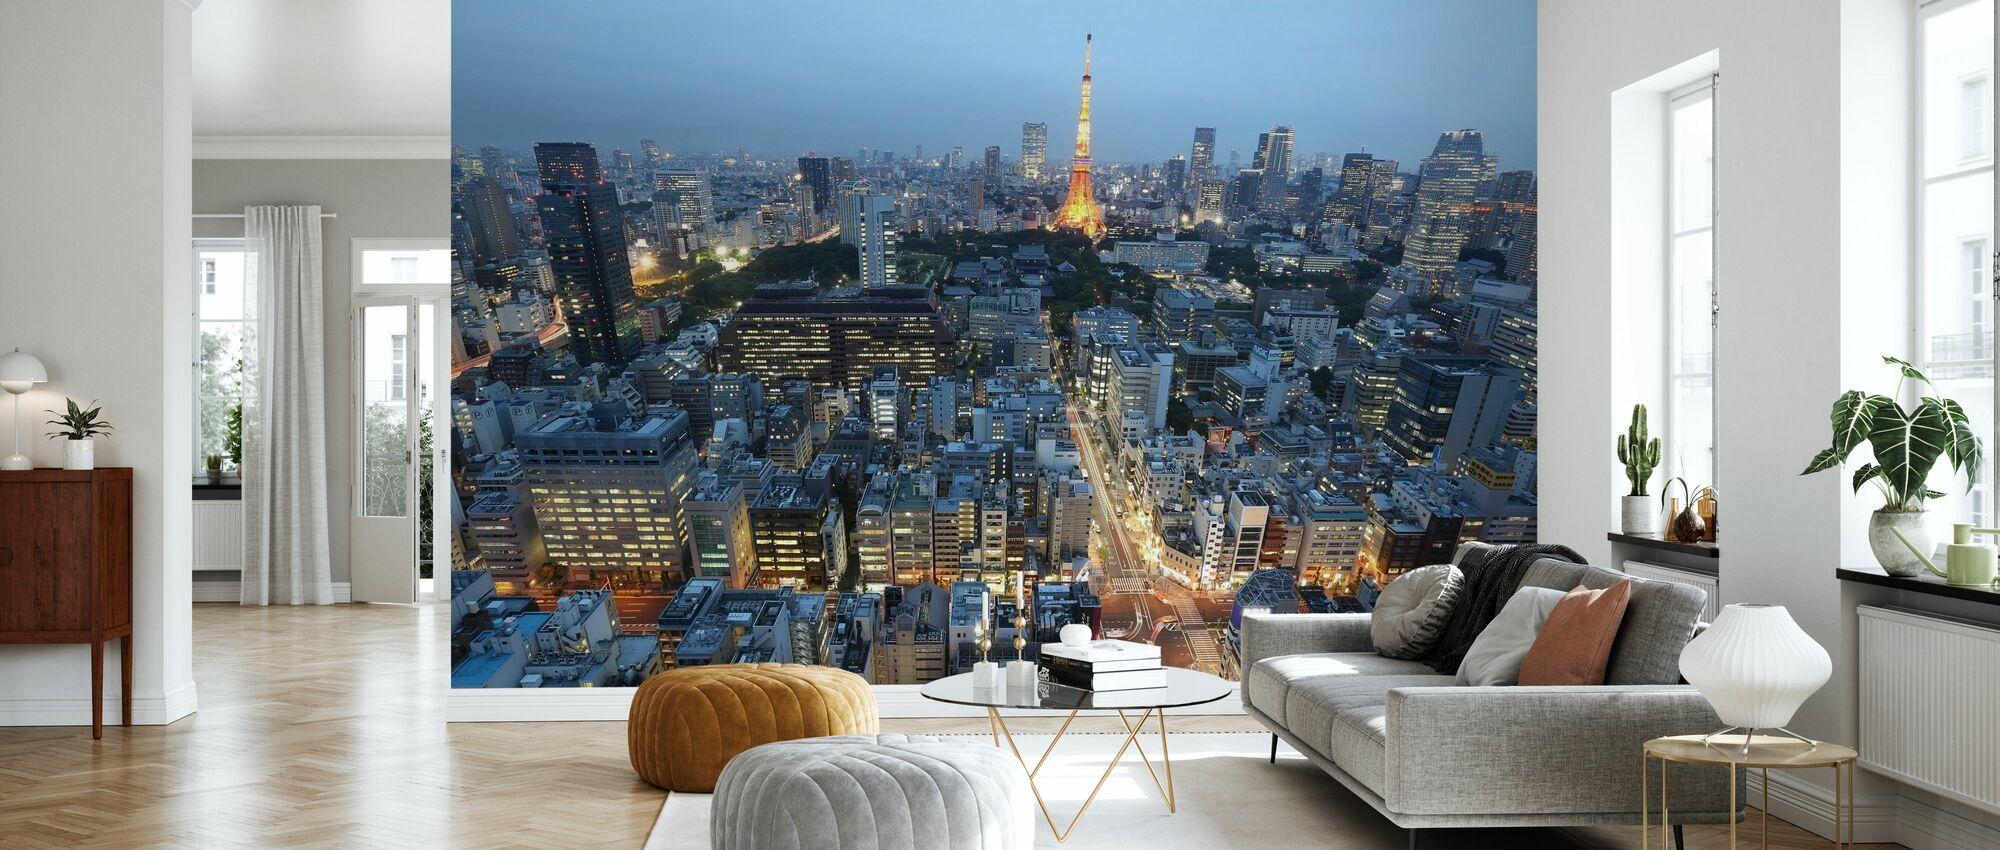 Downtown Paris - Wallpaper - Living Room